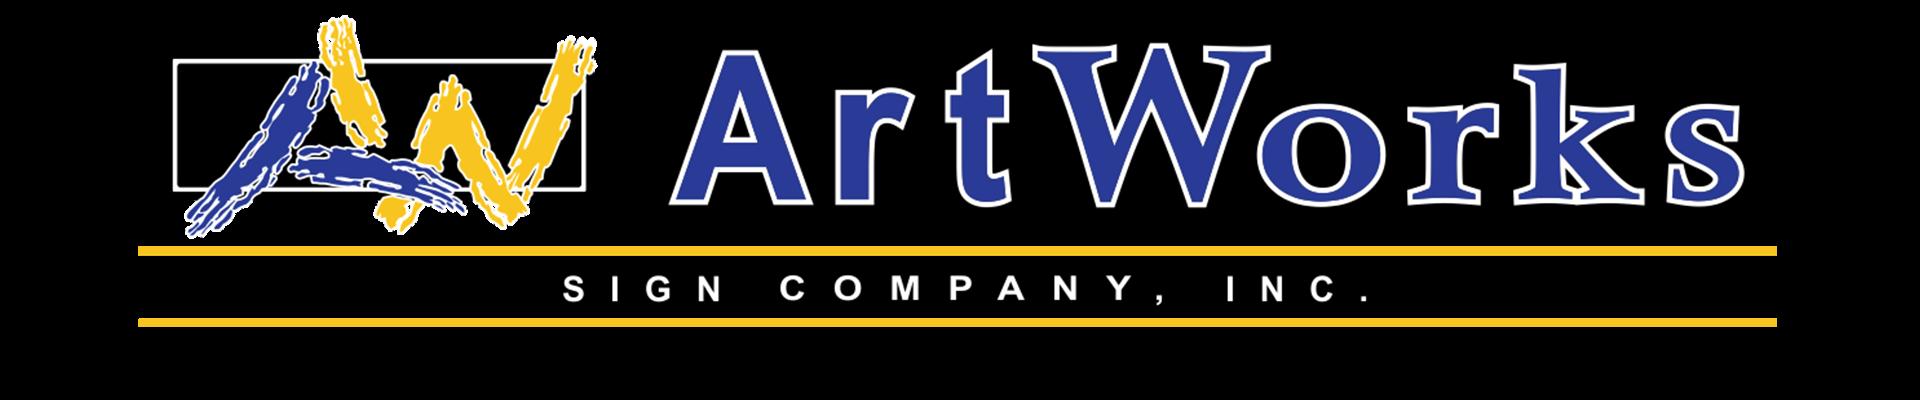 Art Works Sign Company, Inc.